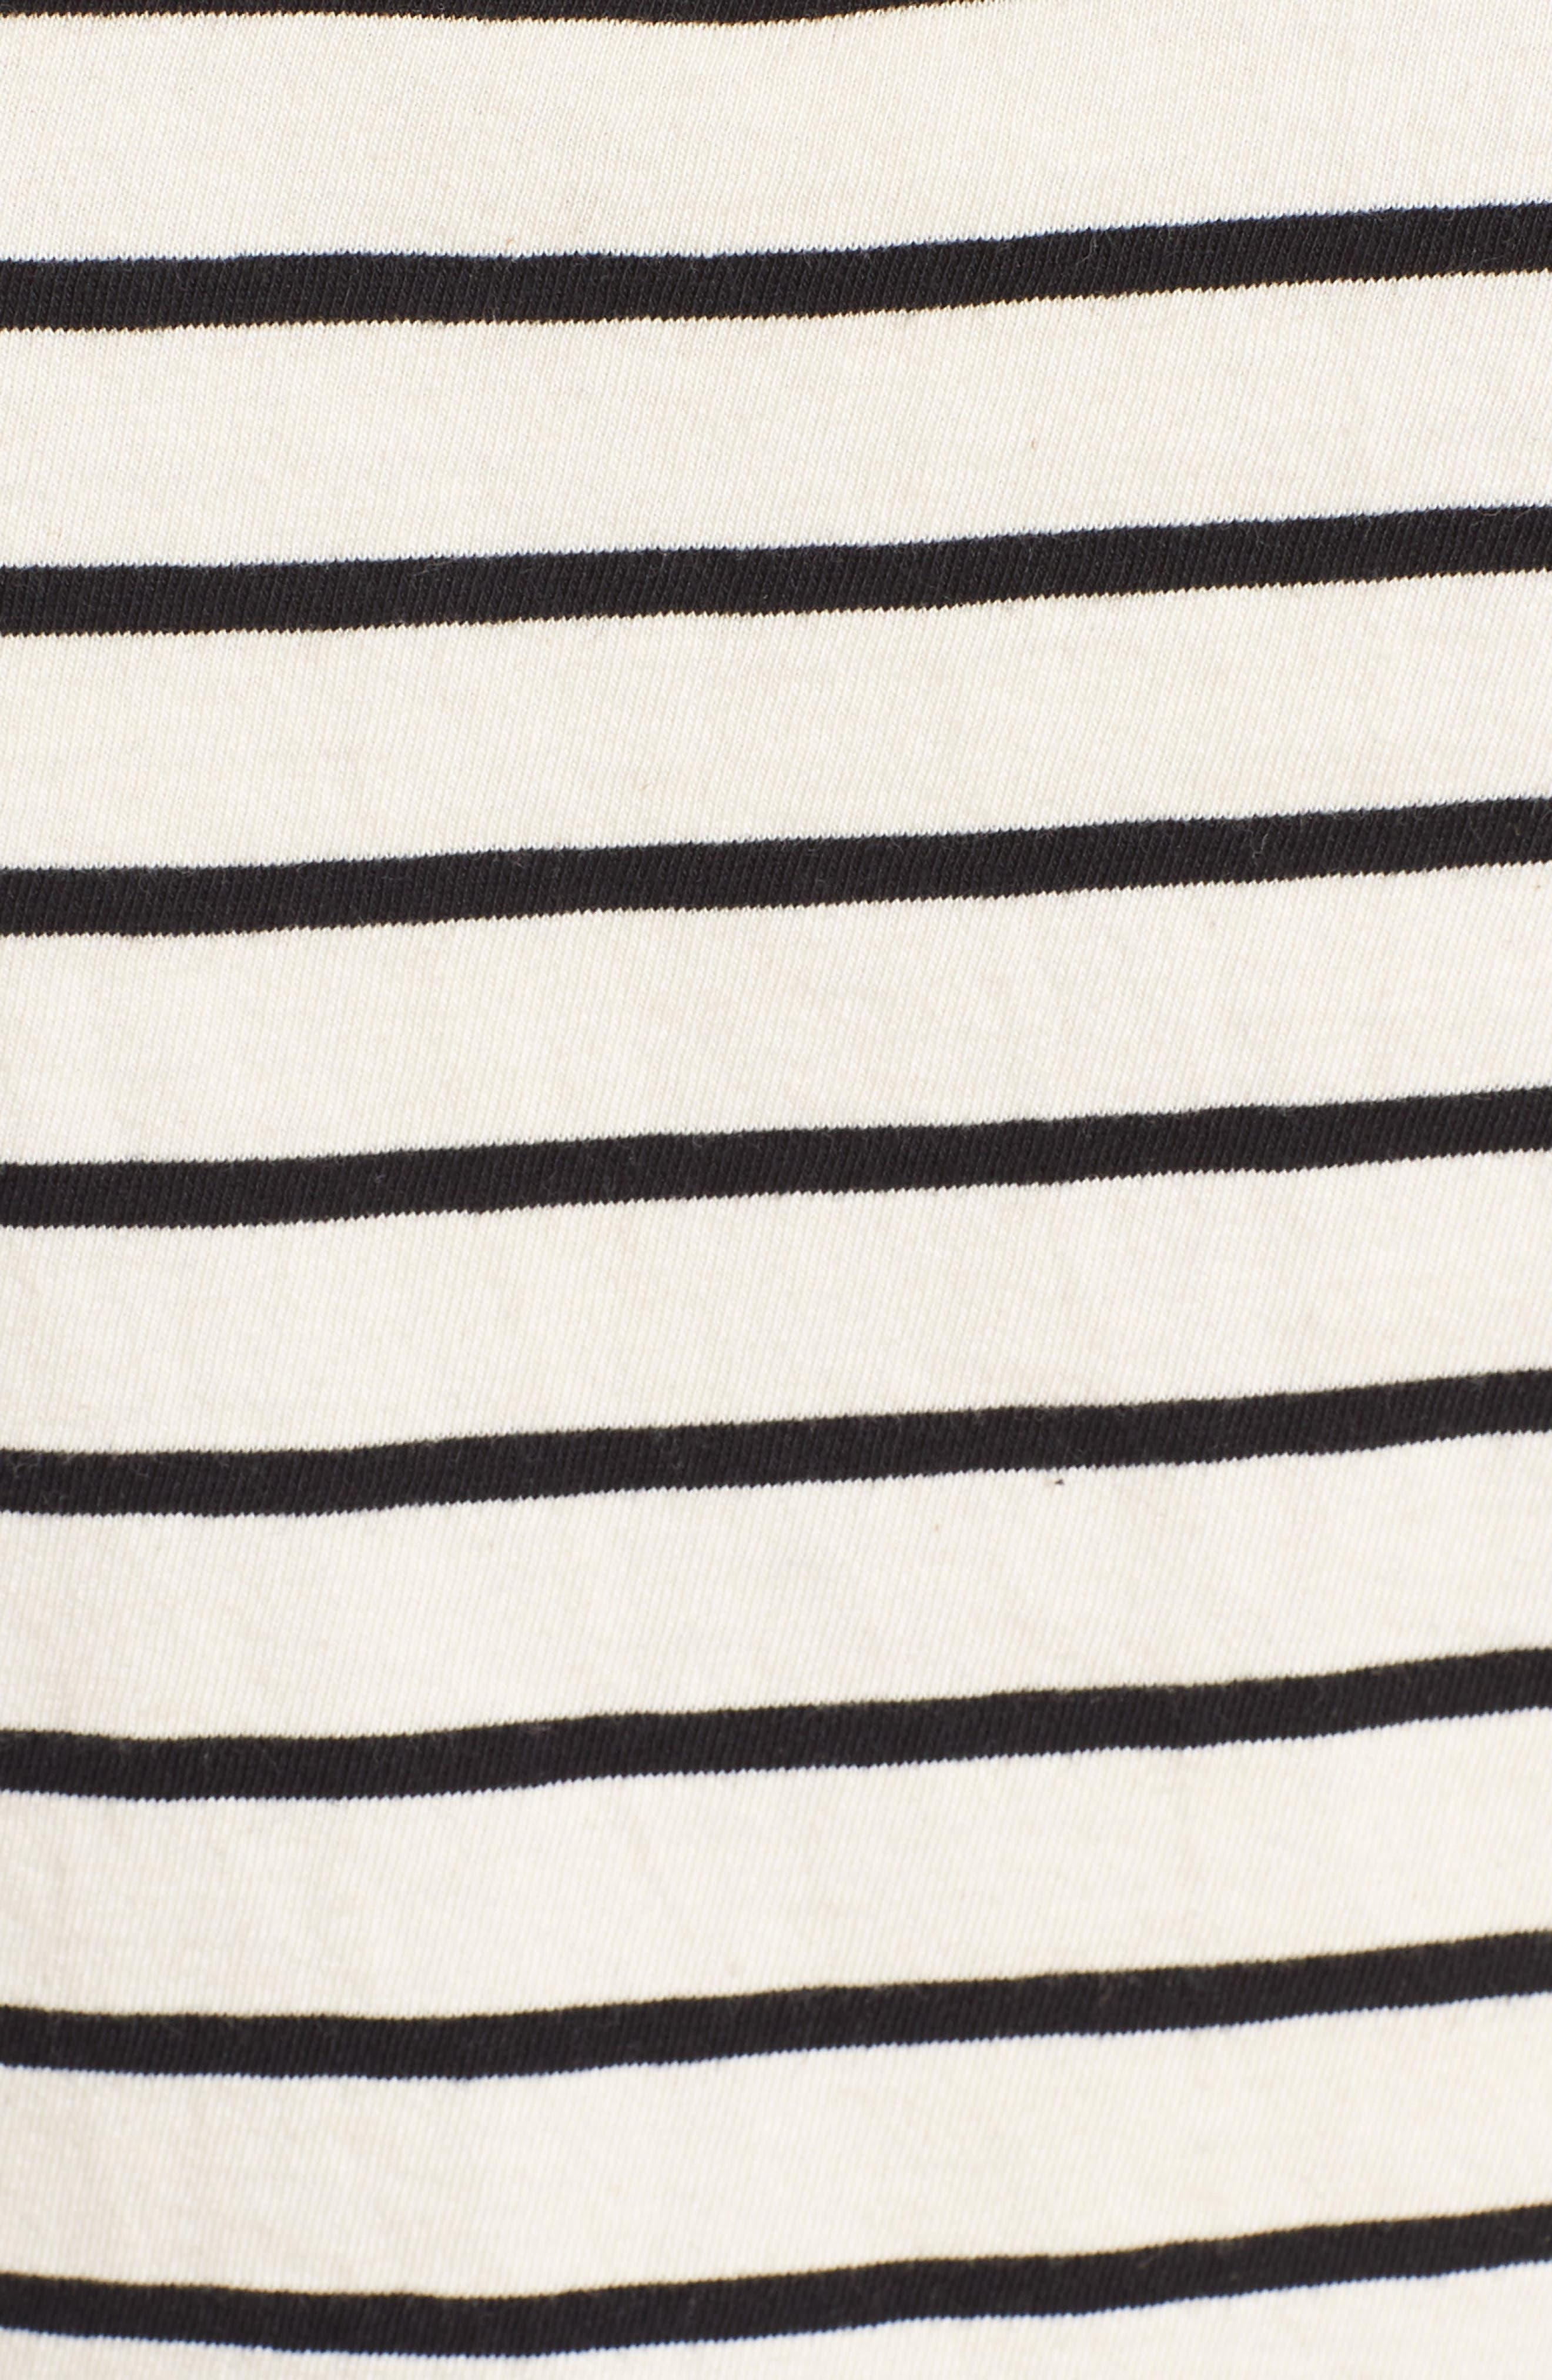 Stripe Mock Neck Sweater,                             Alternate thumbnail 4, color,                             Black/ Cream